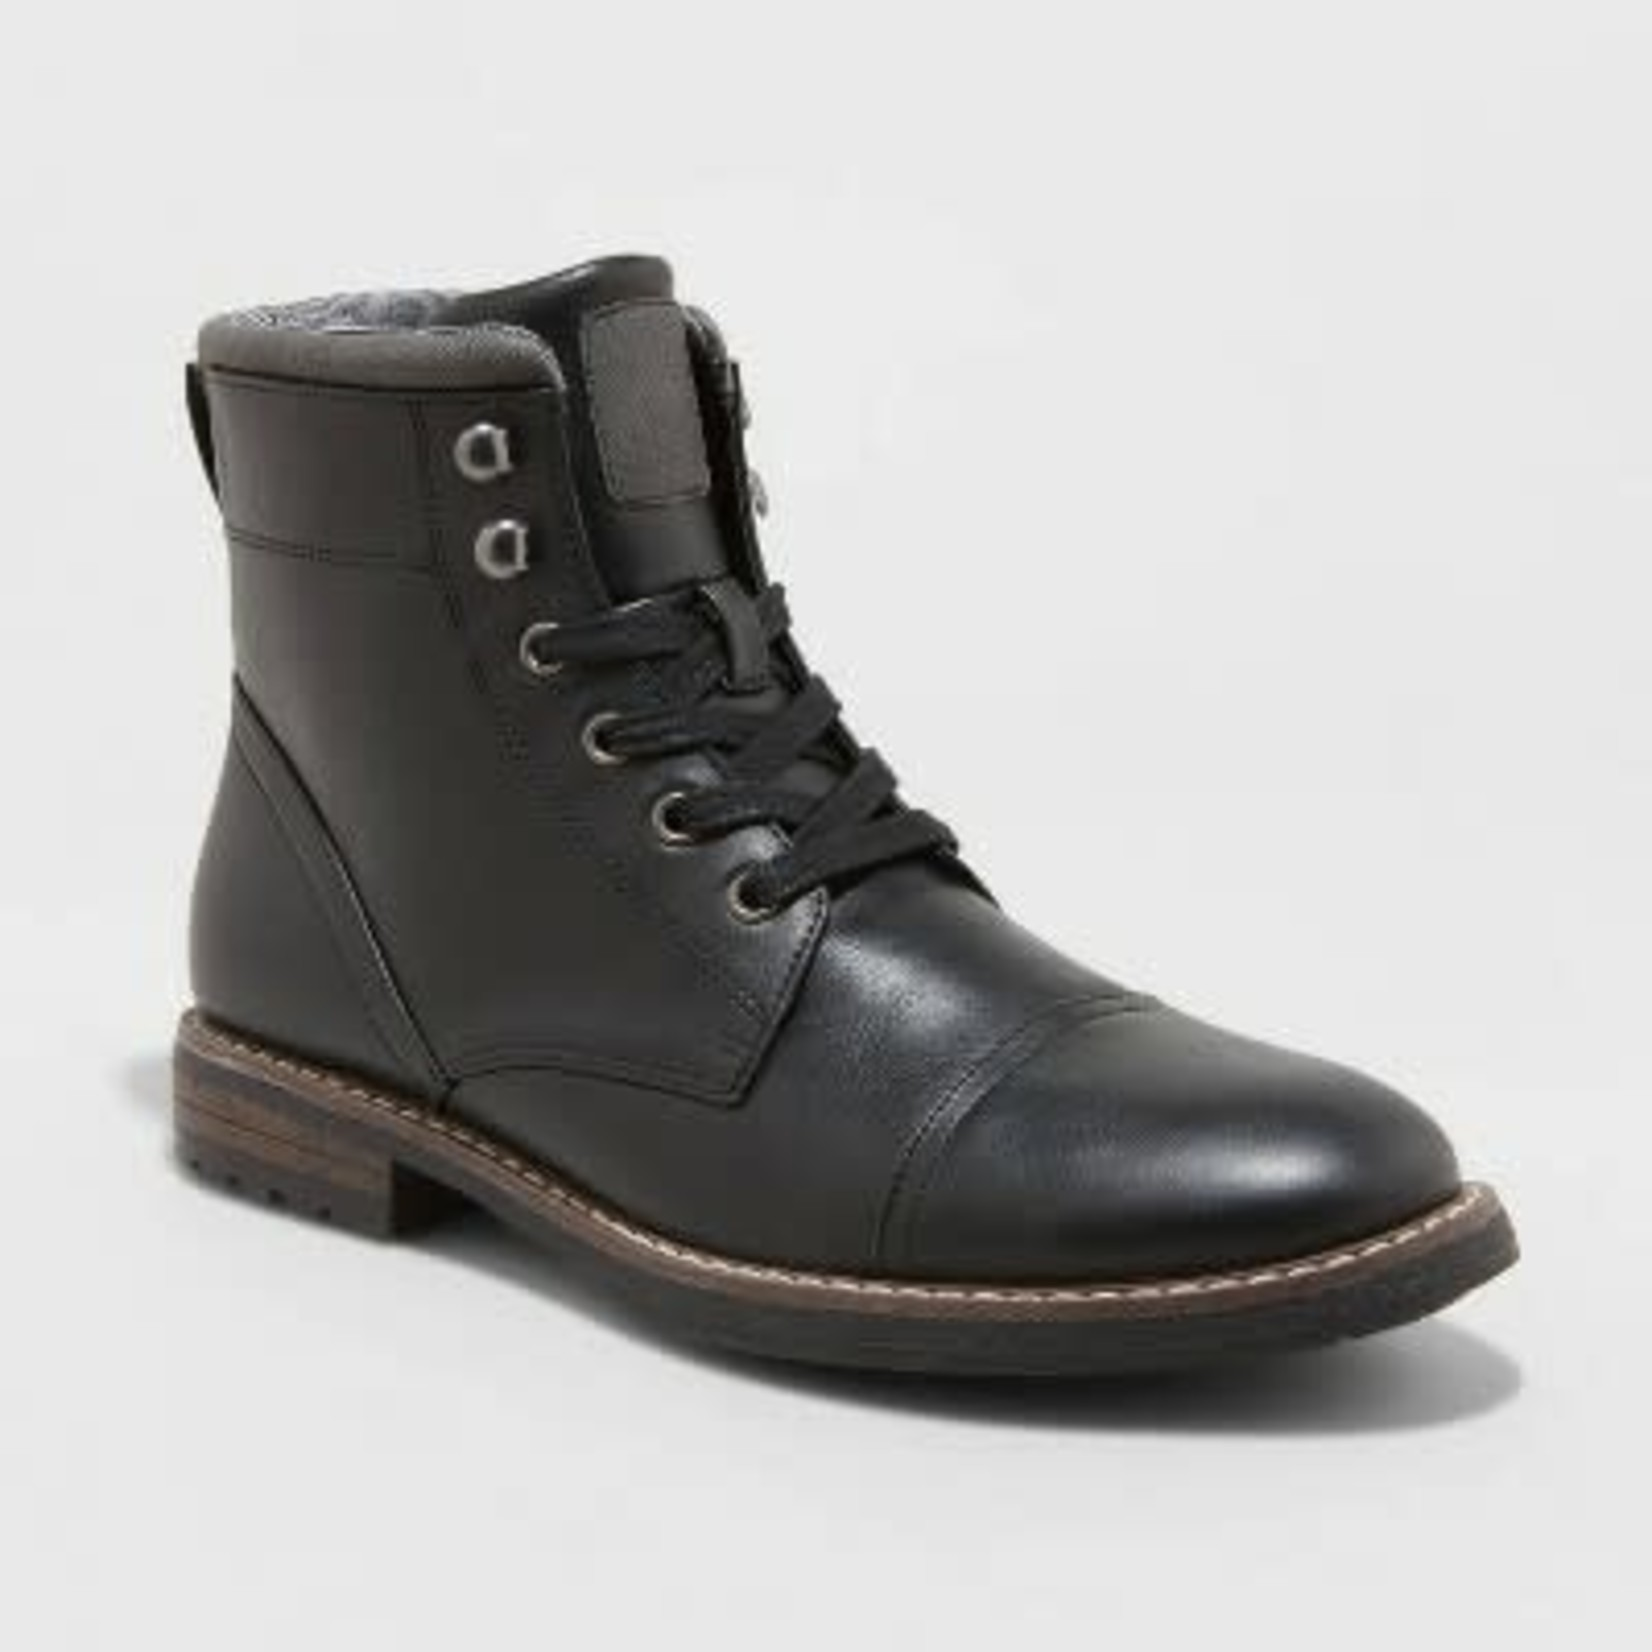 Men's Jeffrey Cap Toe Combat Boots - Goodfellow & Co- black - 8